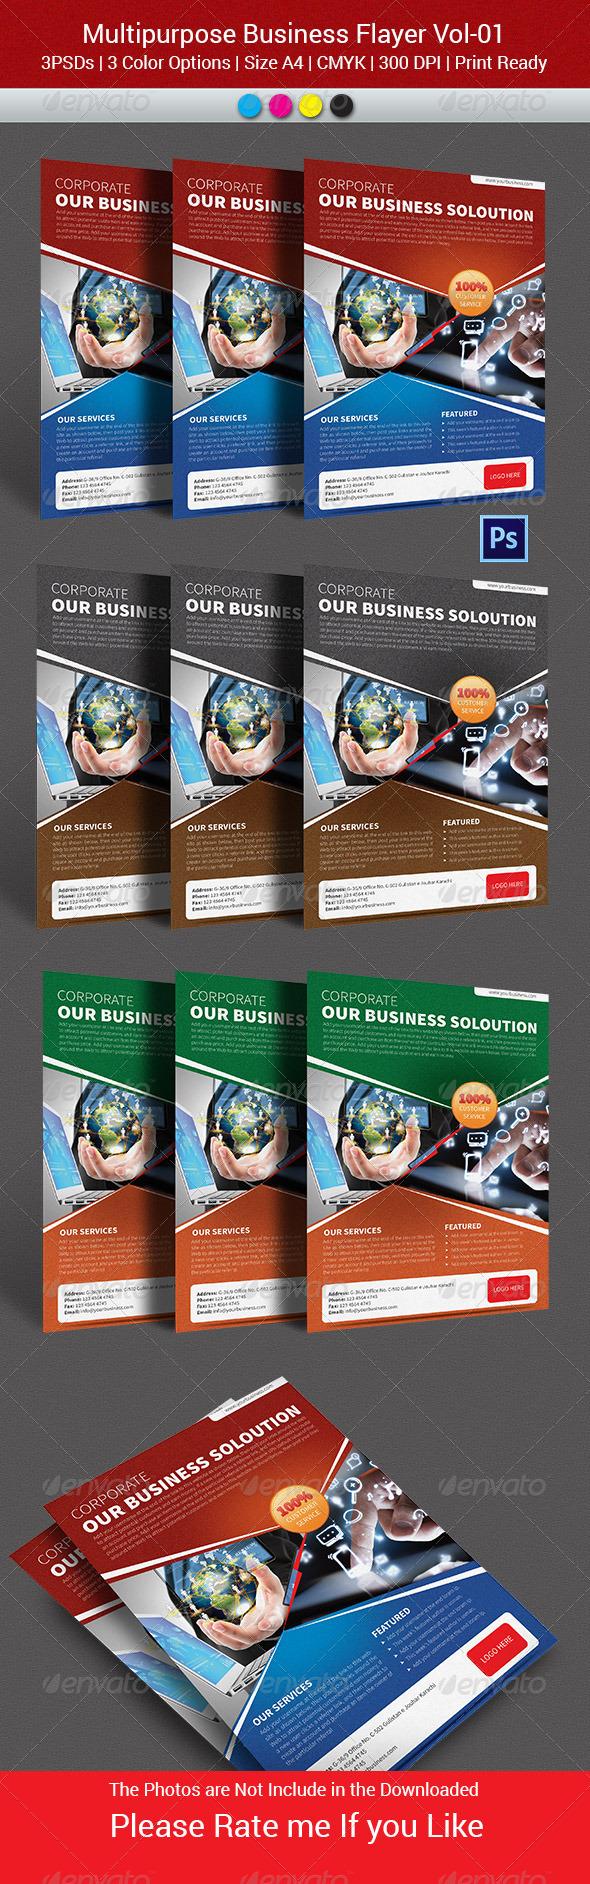 GraphicRiver Multipurpose Business Flyer Vol-01 6123326